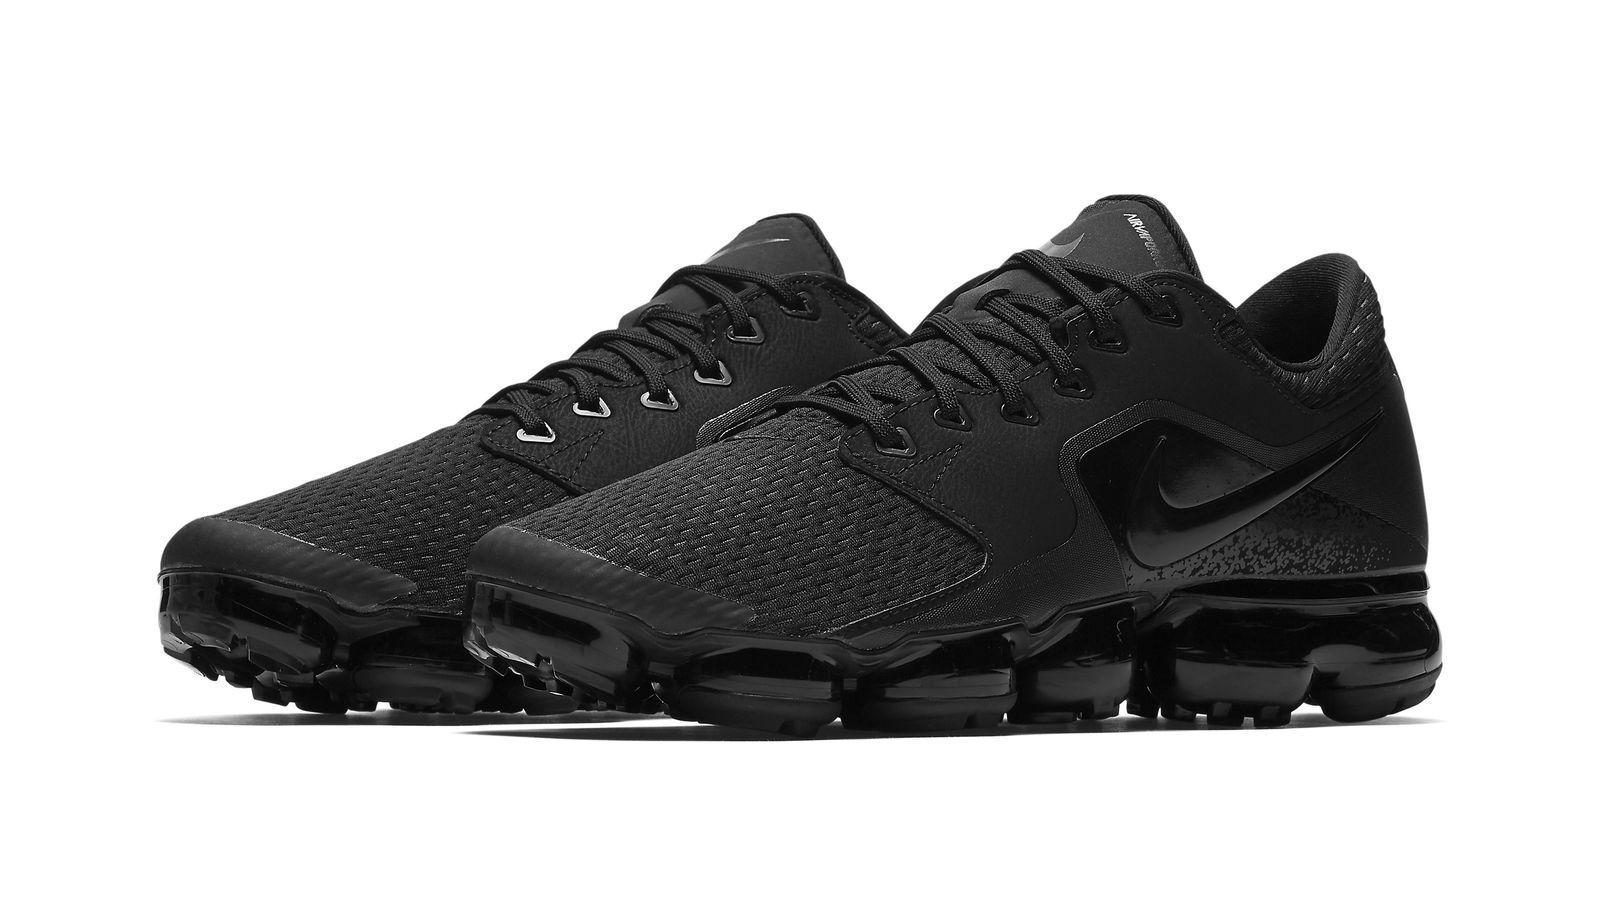 c0554524a08 Nike Air Vapormax CS Mens Triple Black Running Trainer Sneaker ...